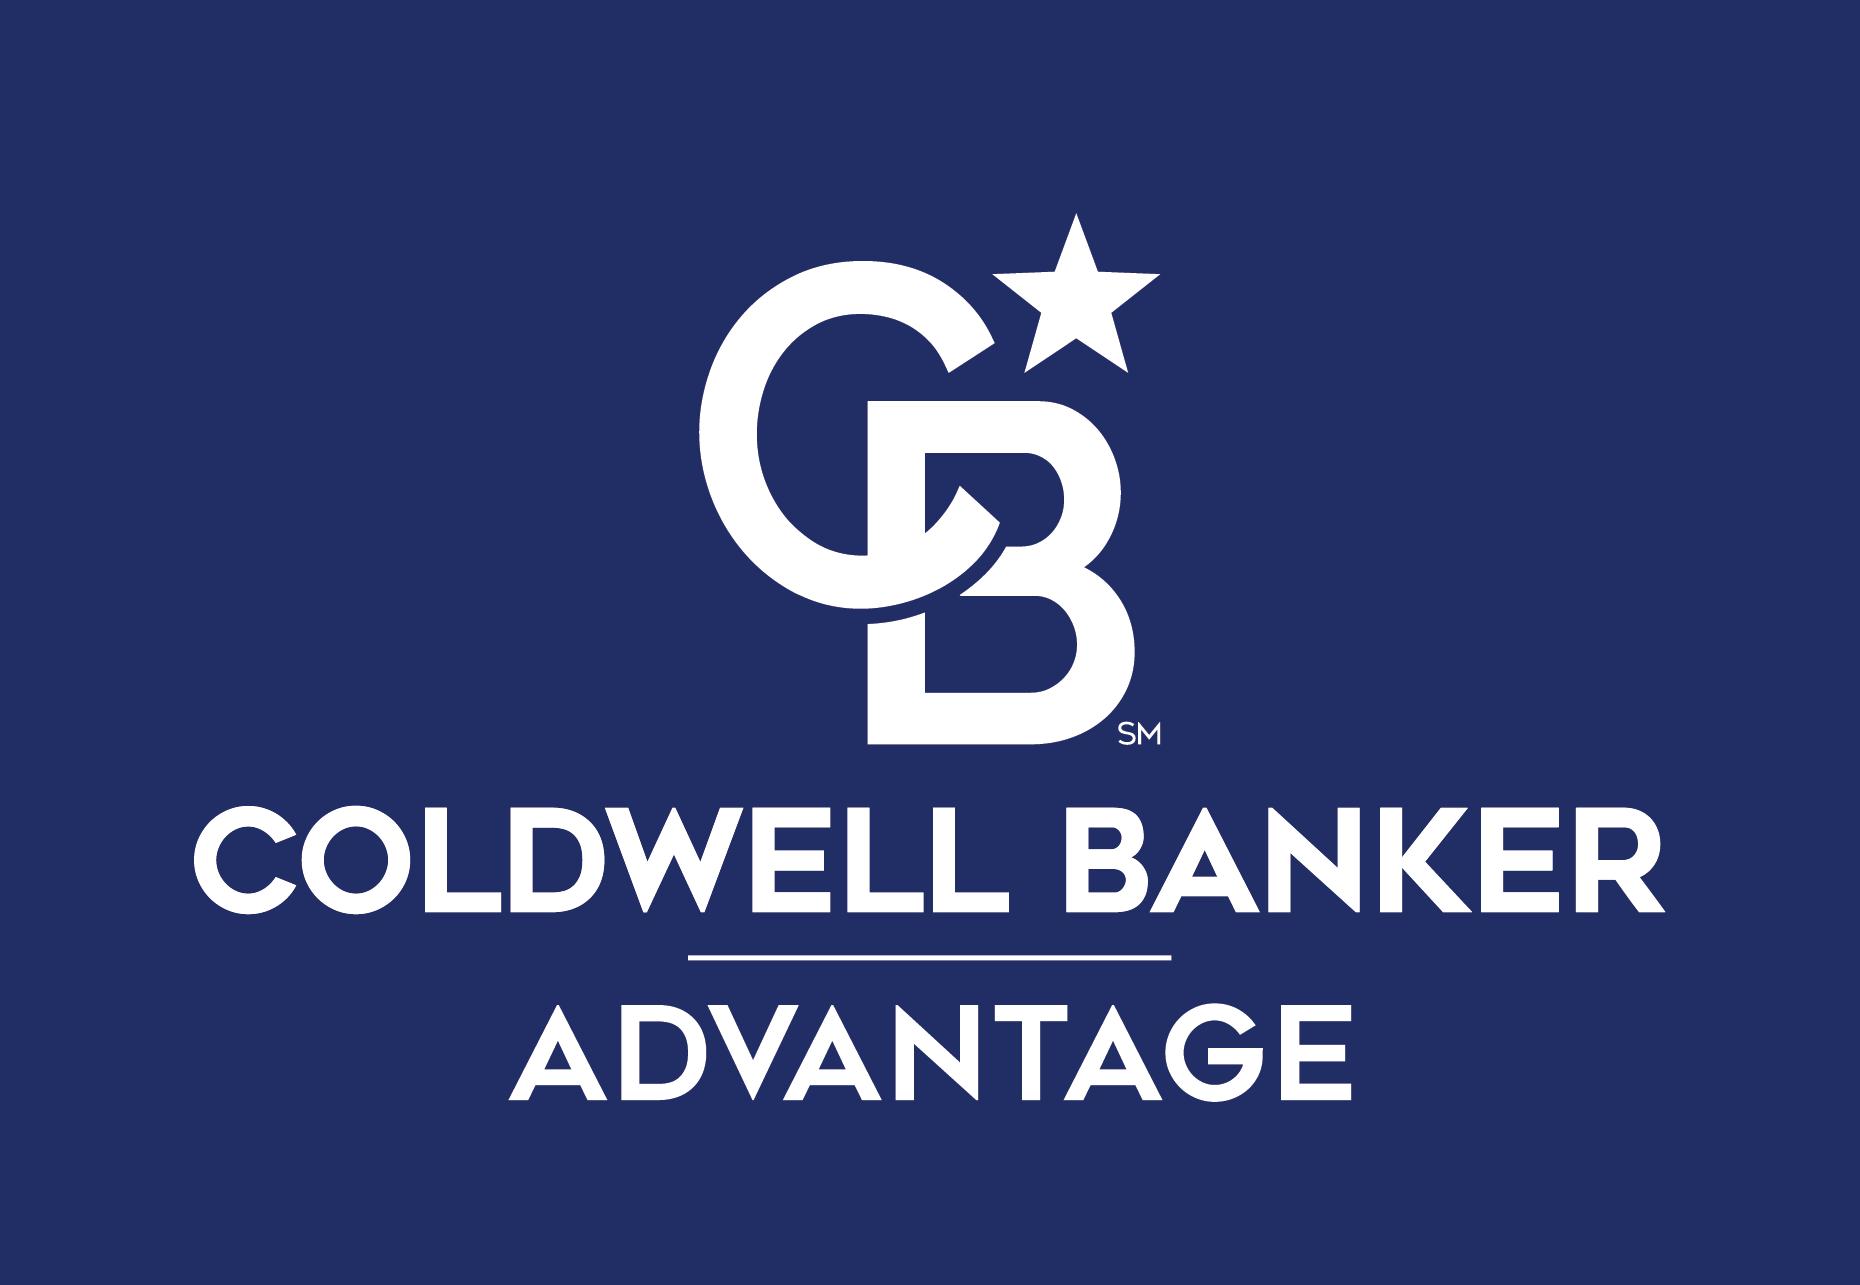 Edward Jones - Coldwell Banker Advantage Logo